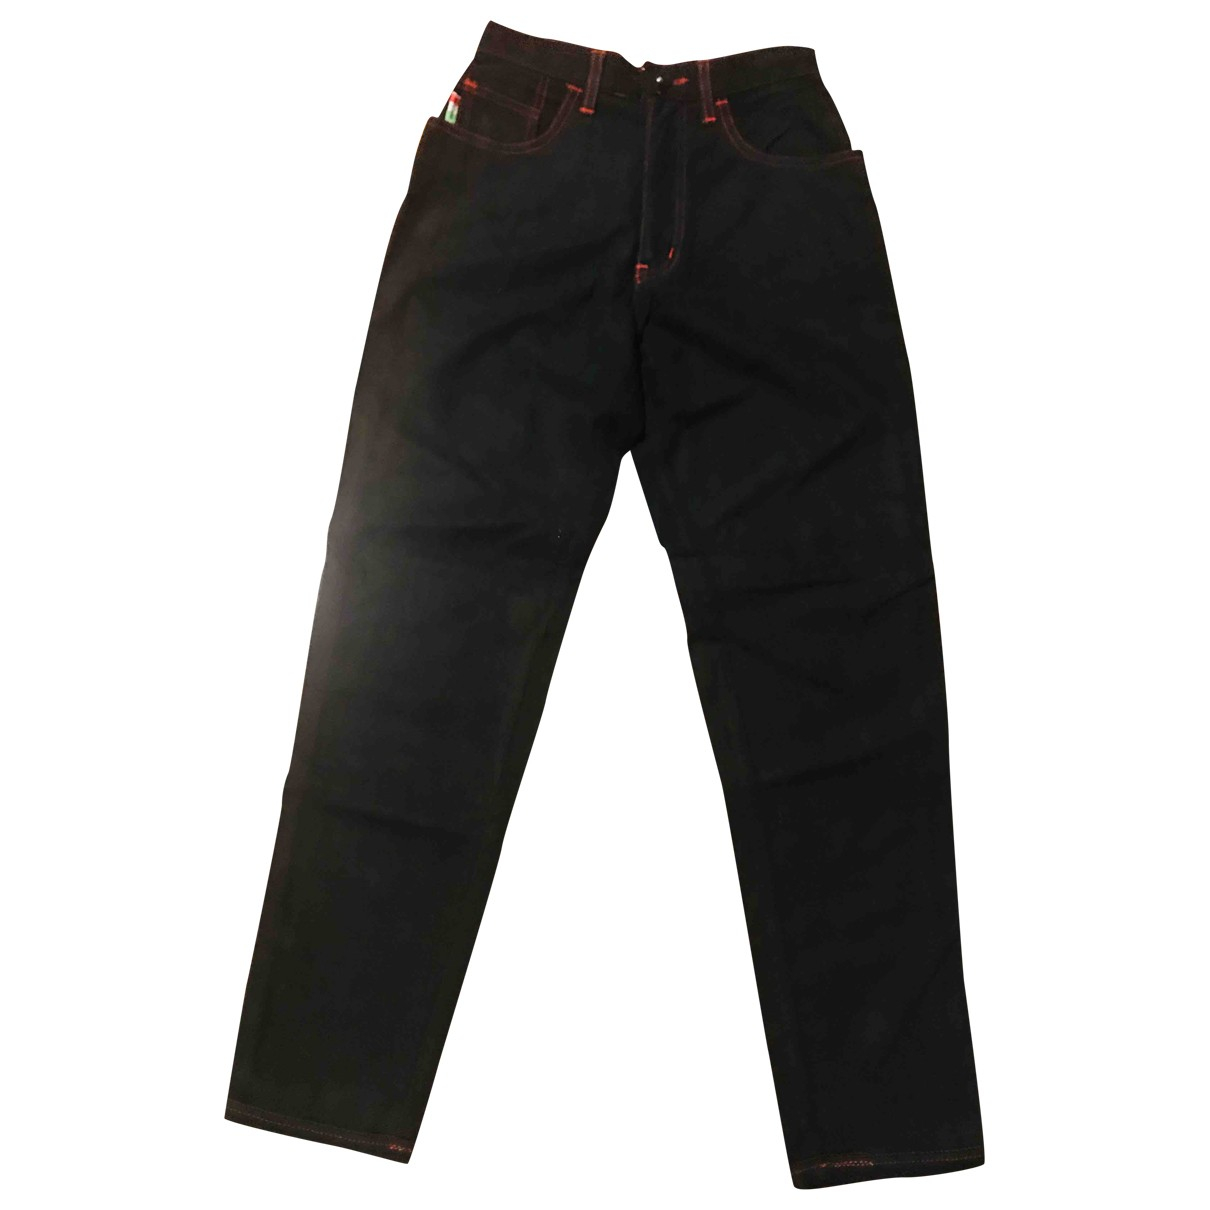 Moschino - Pantalon   pour femme - noir